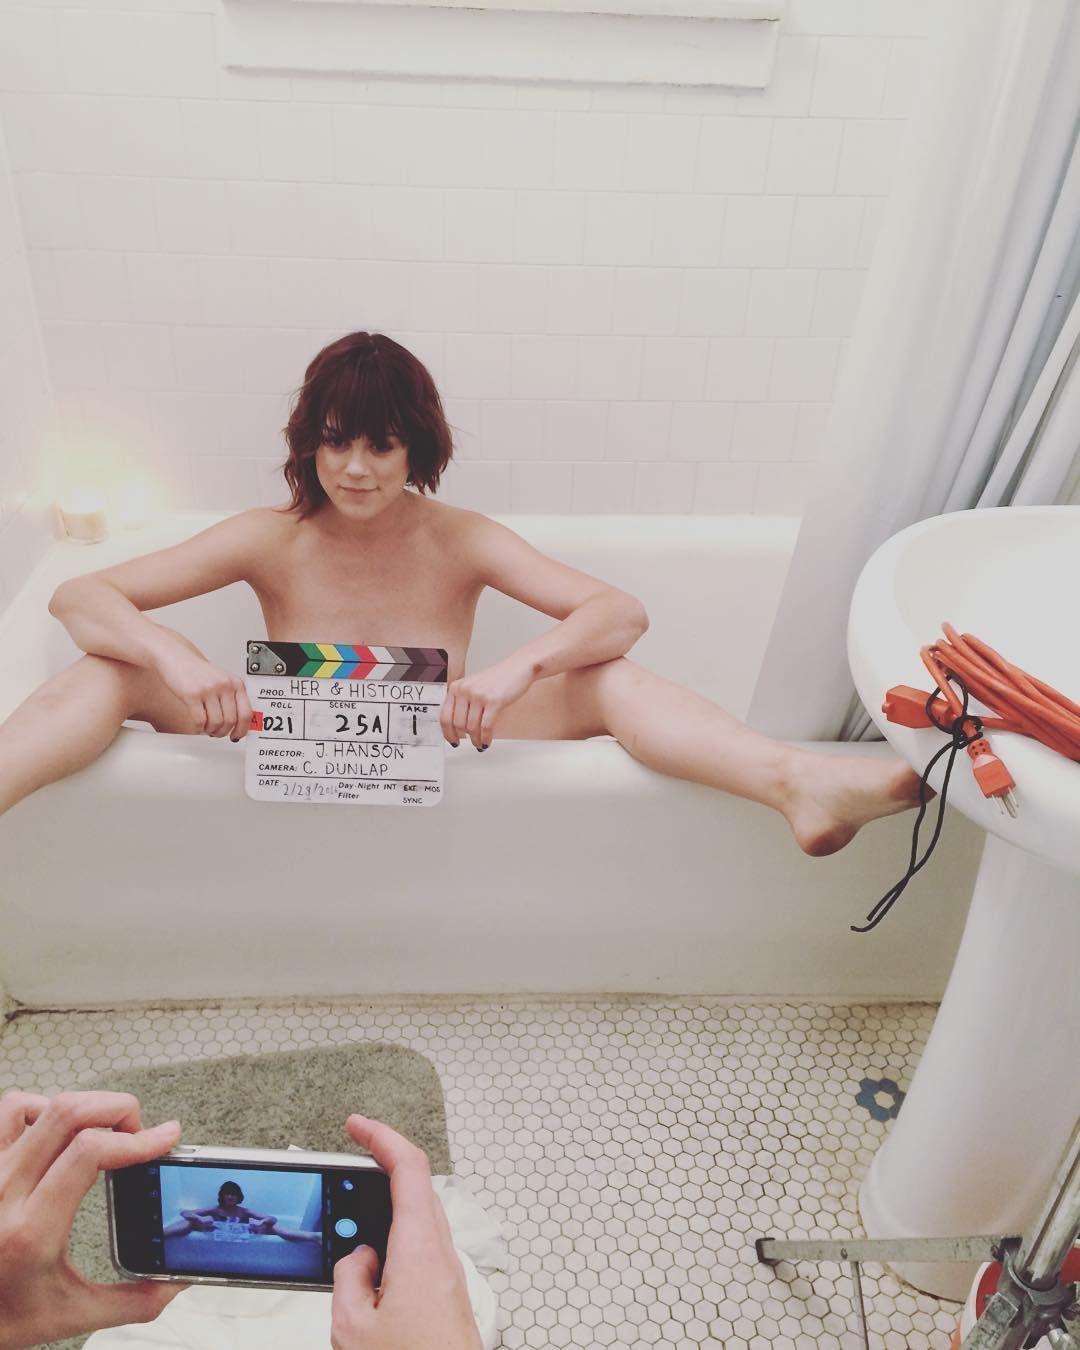 Feet Lindsey Shaw nudes (35 foto and video), Topless, Bikini, Feet, butt 2015